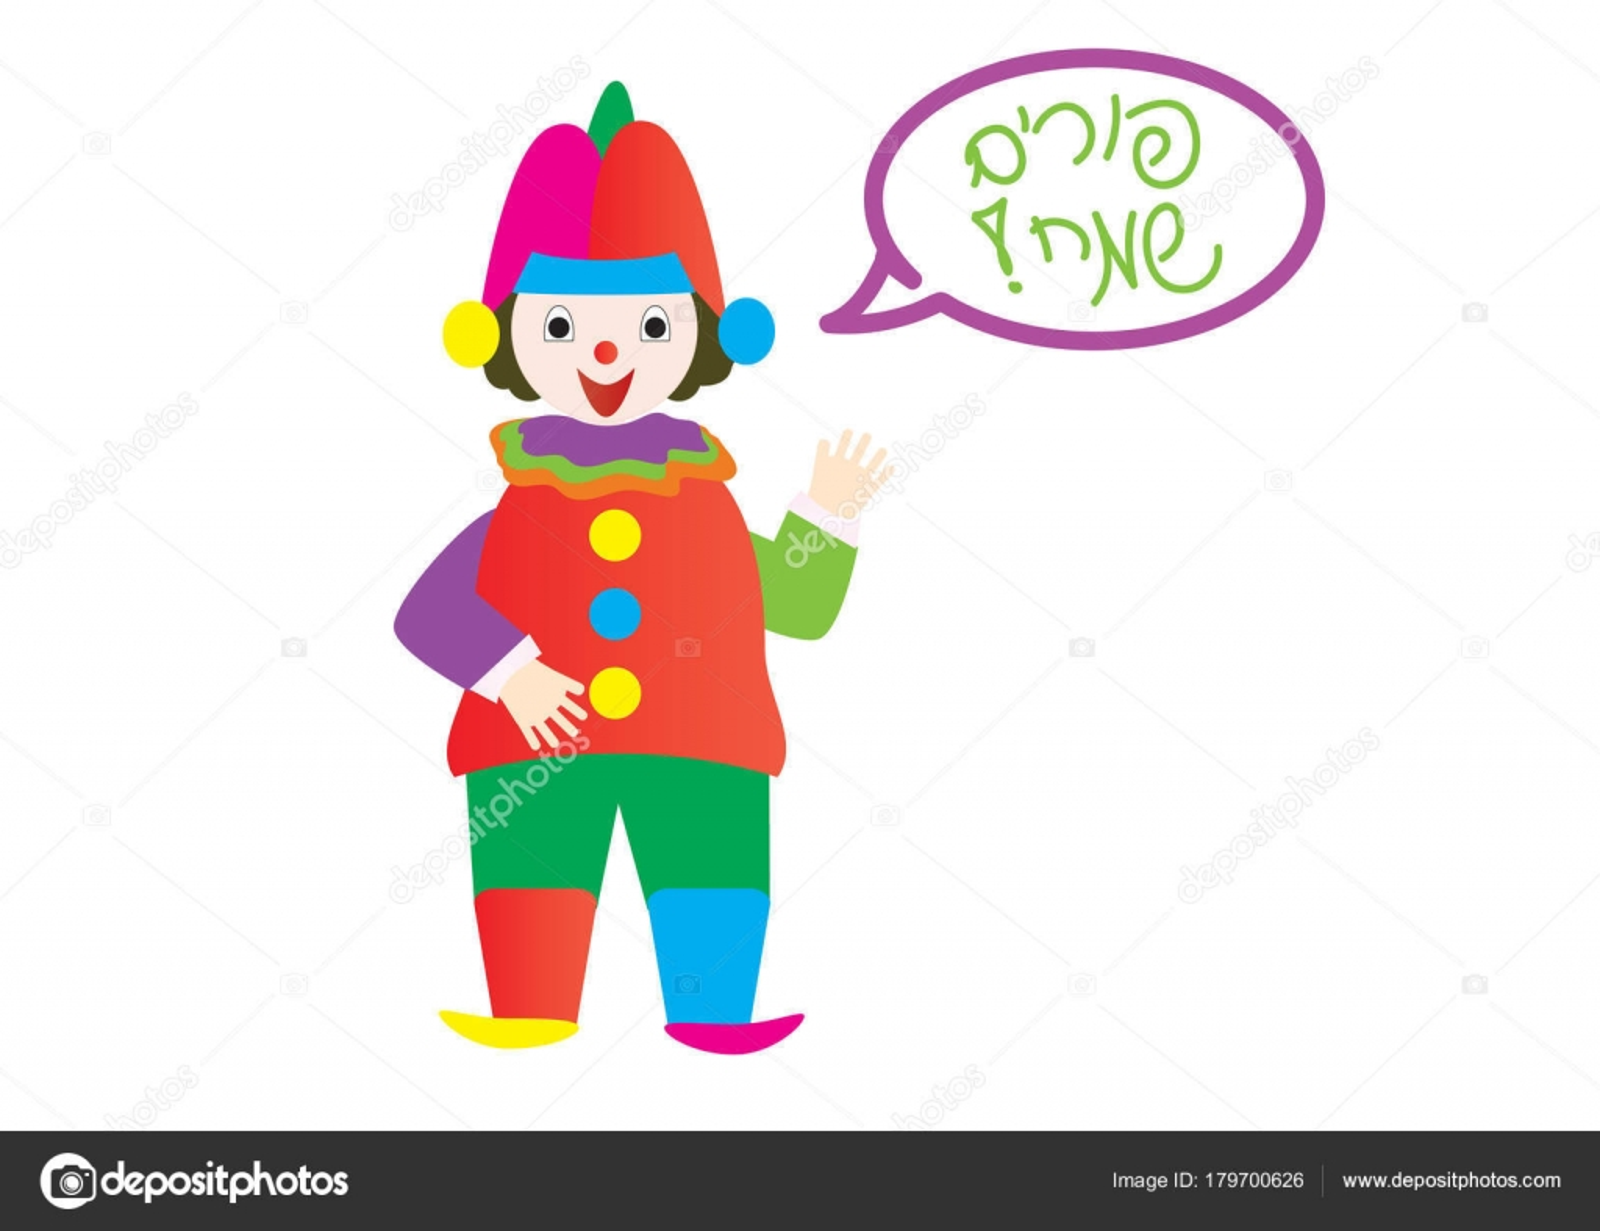 Clown and purim jewish holiday hebrew greeting in a talking bubble clown and purim jewish holiday hebrew greeting in a talking bubble stock vector m4hsunfo